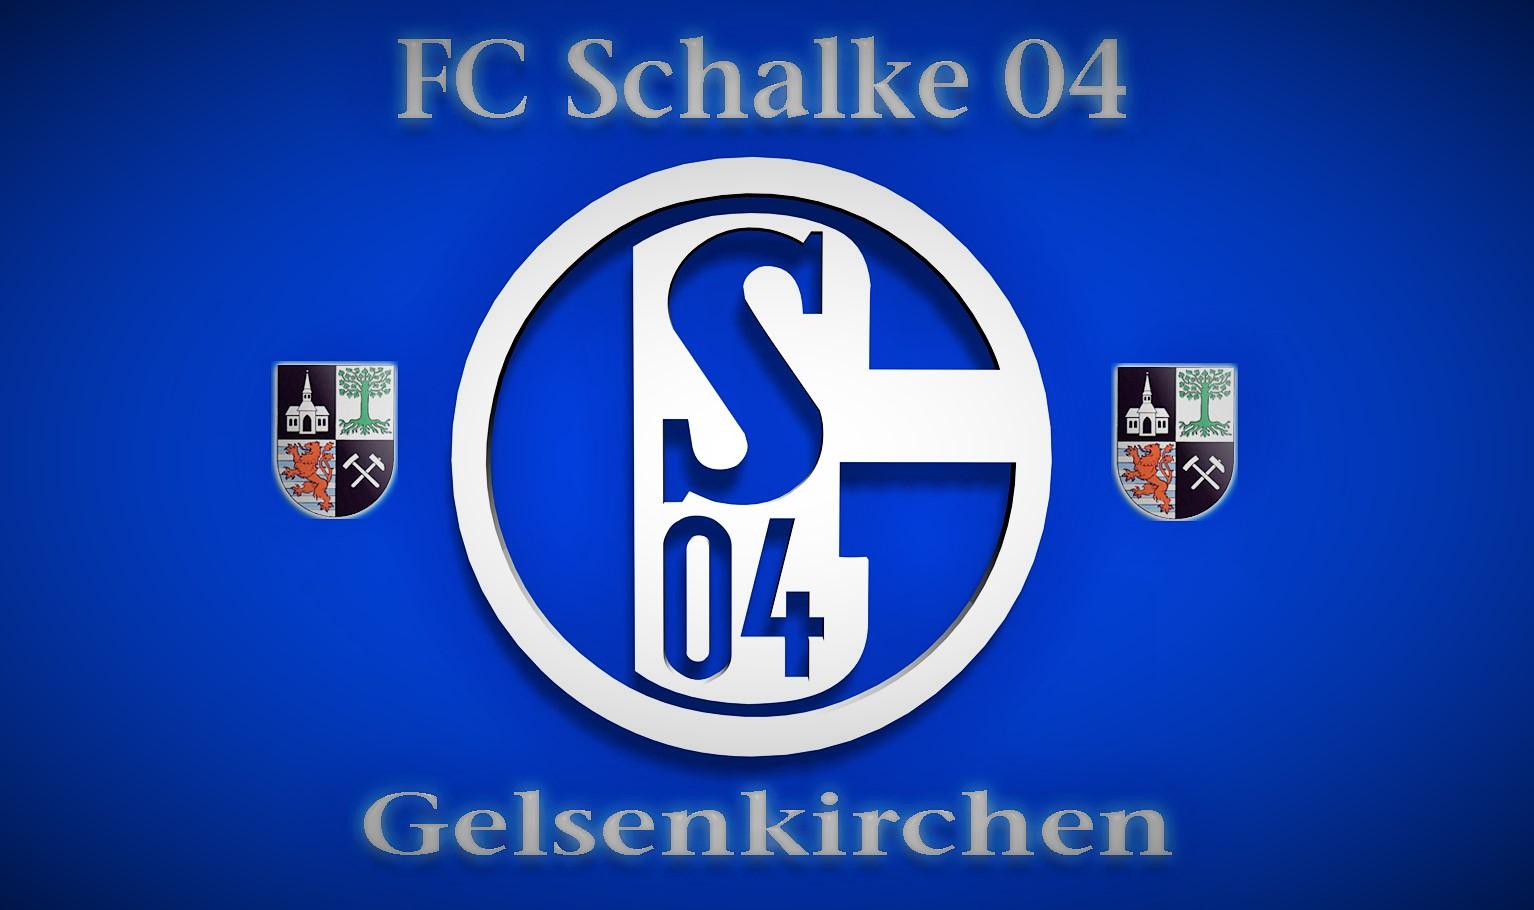 homepage schalke 04